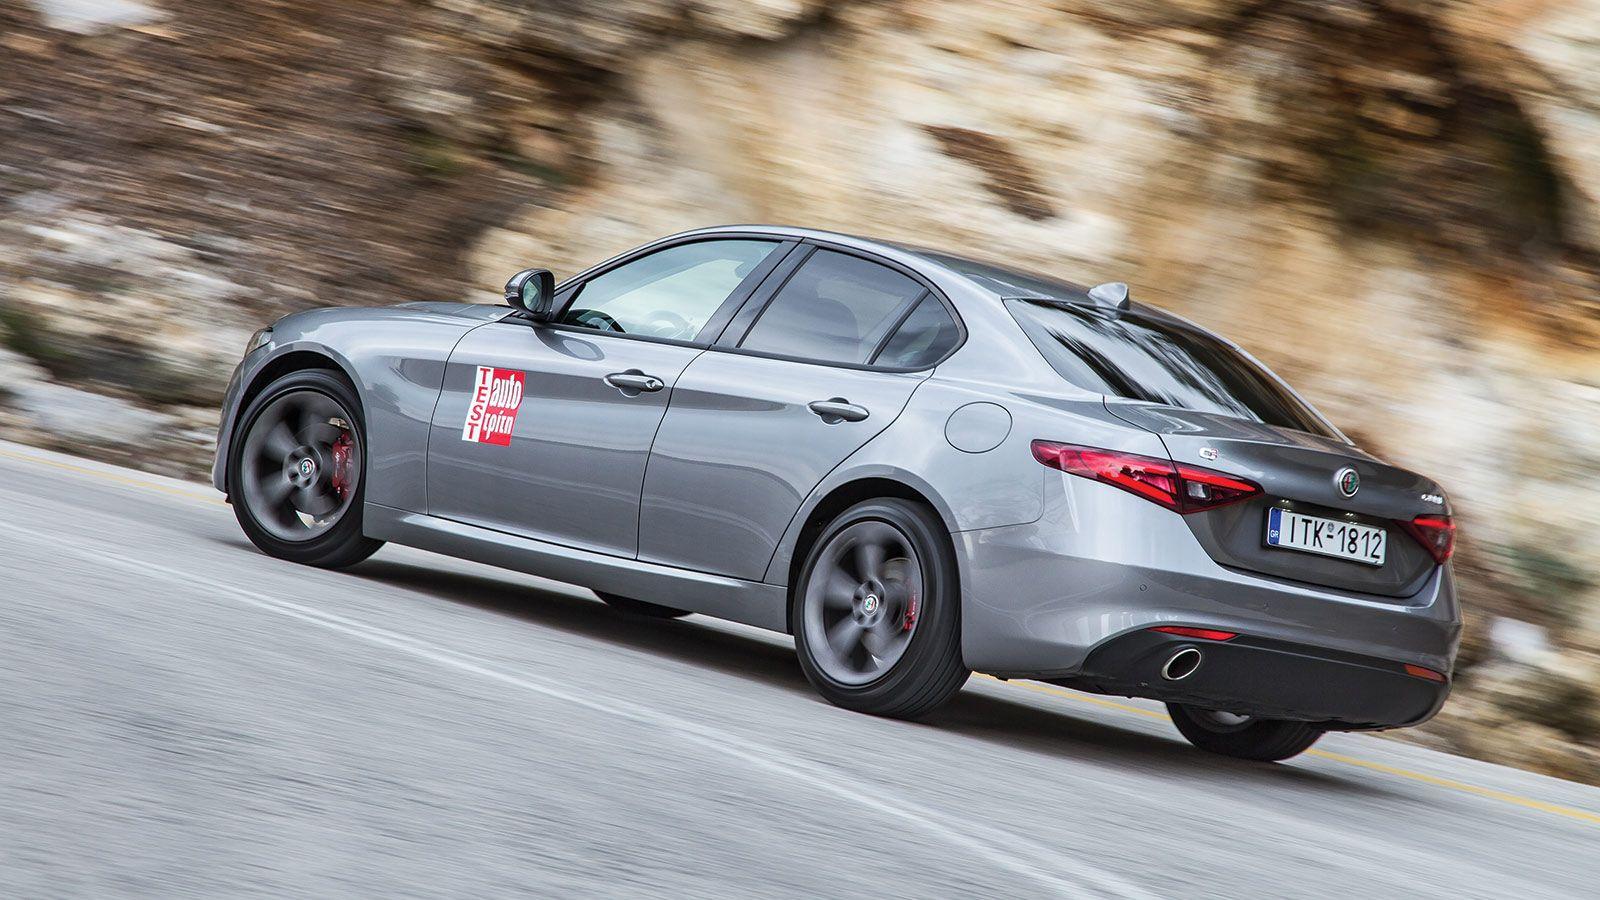 Honda civic gx autotrader 2017 2018 honda reviews for Honda civic gx